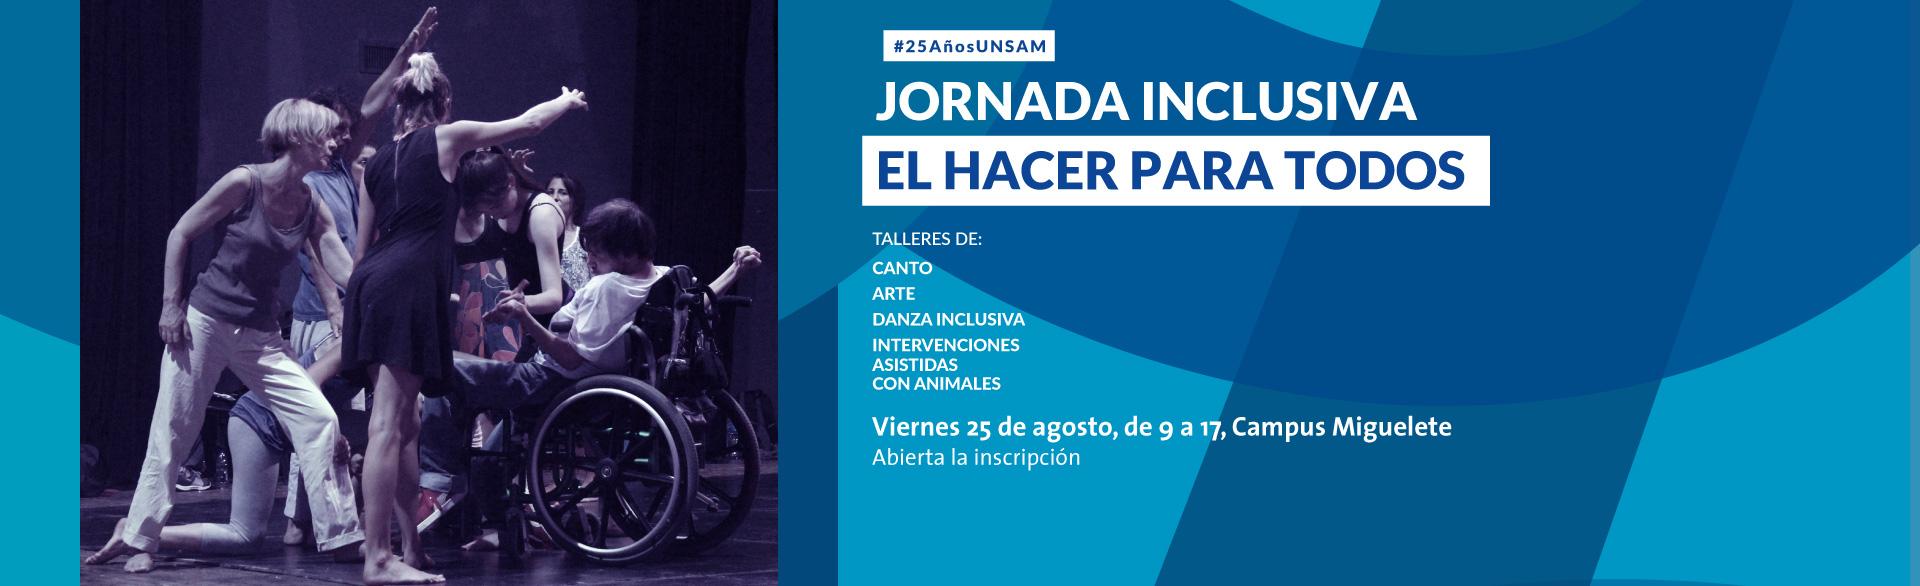 Jornada CAU: